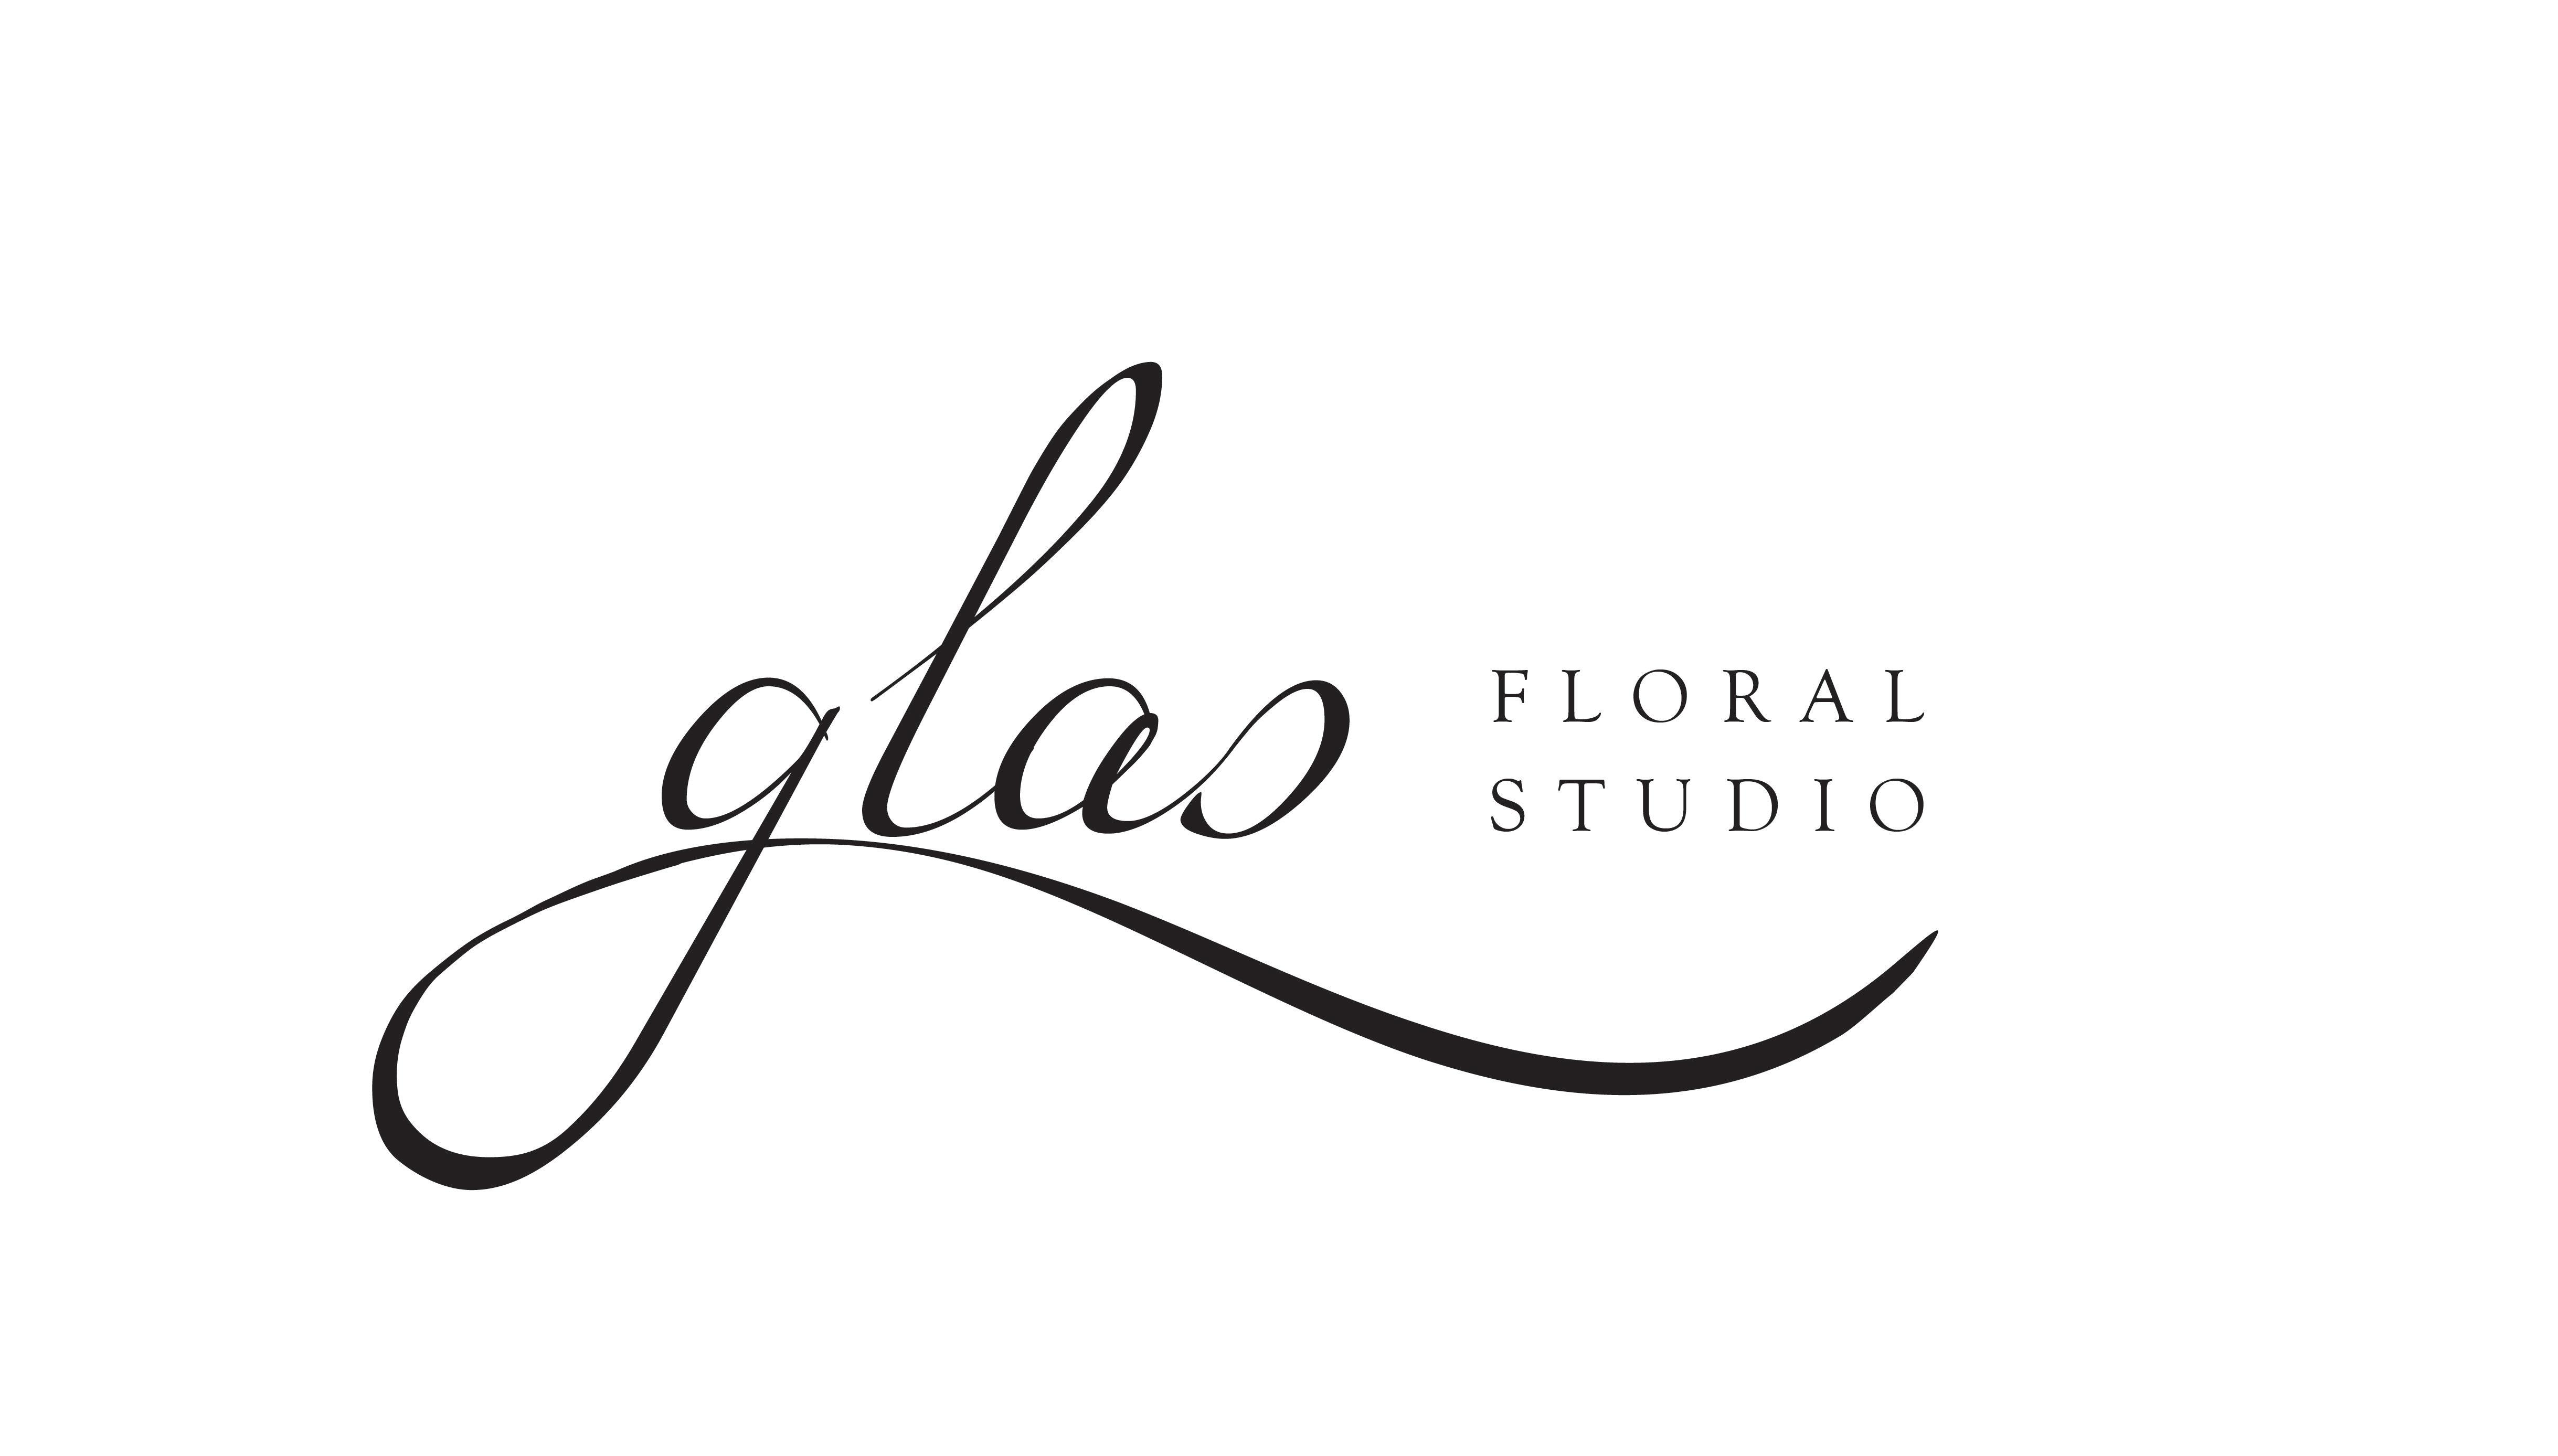 Glas Floral Studio